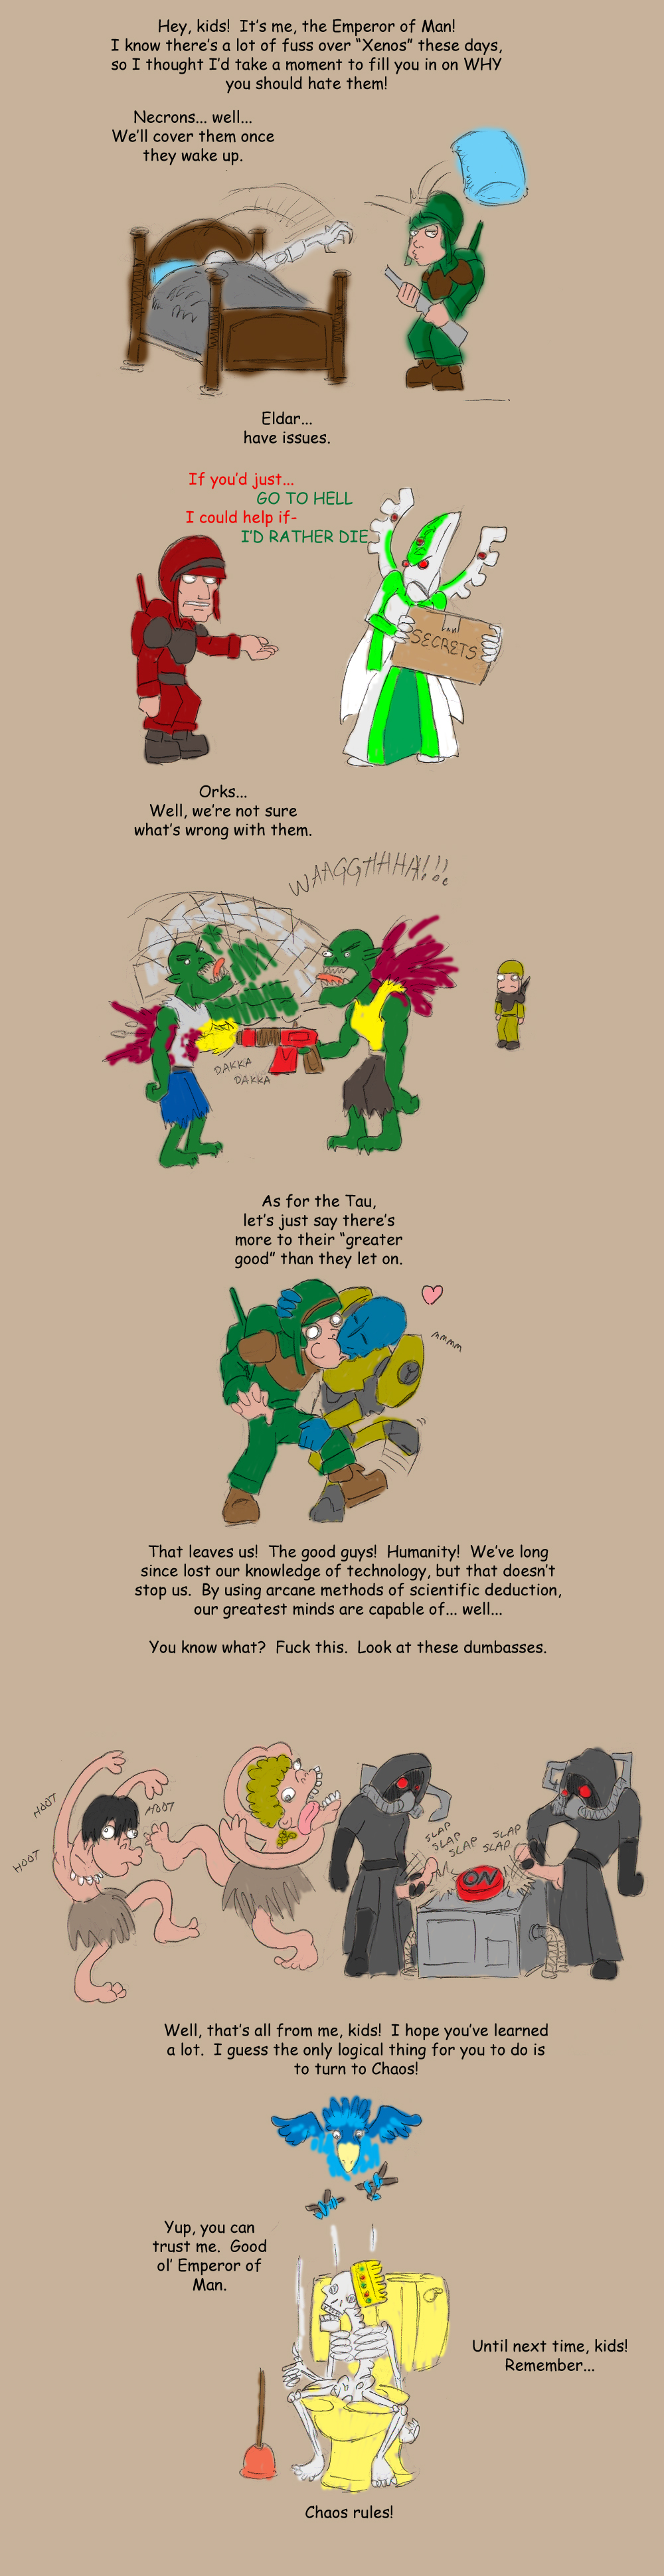 40k slaanesh warhammer chaos god Marvel ultimate alliance 3 hela